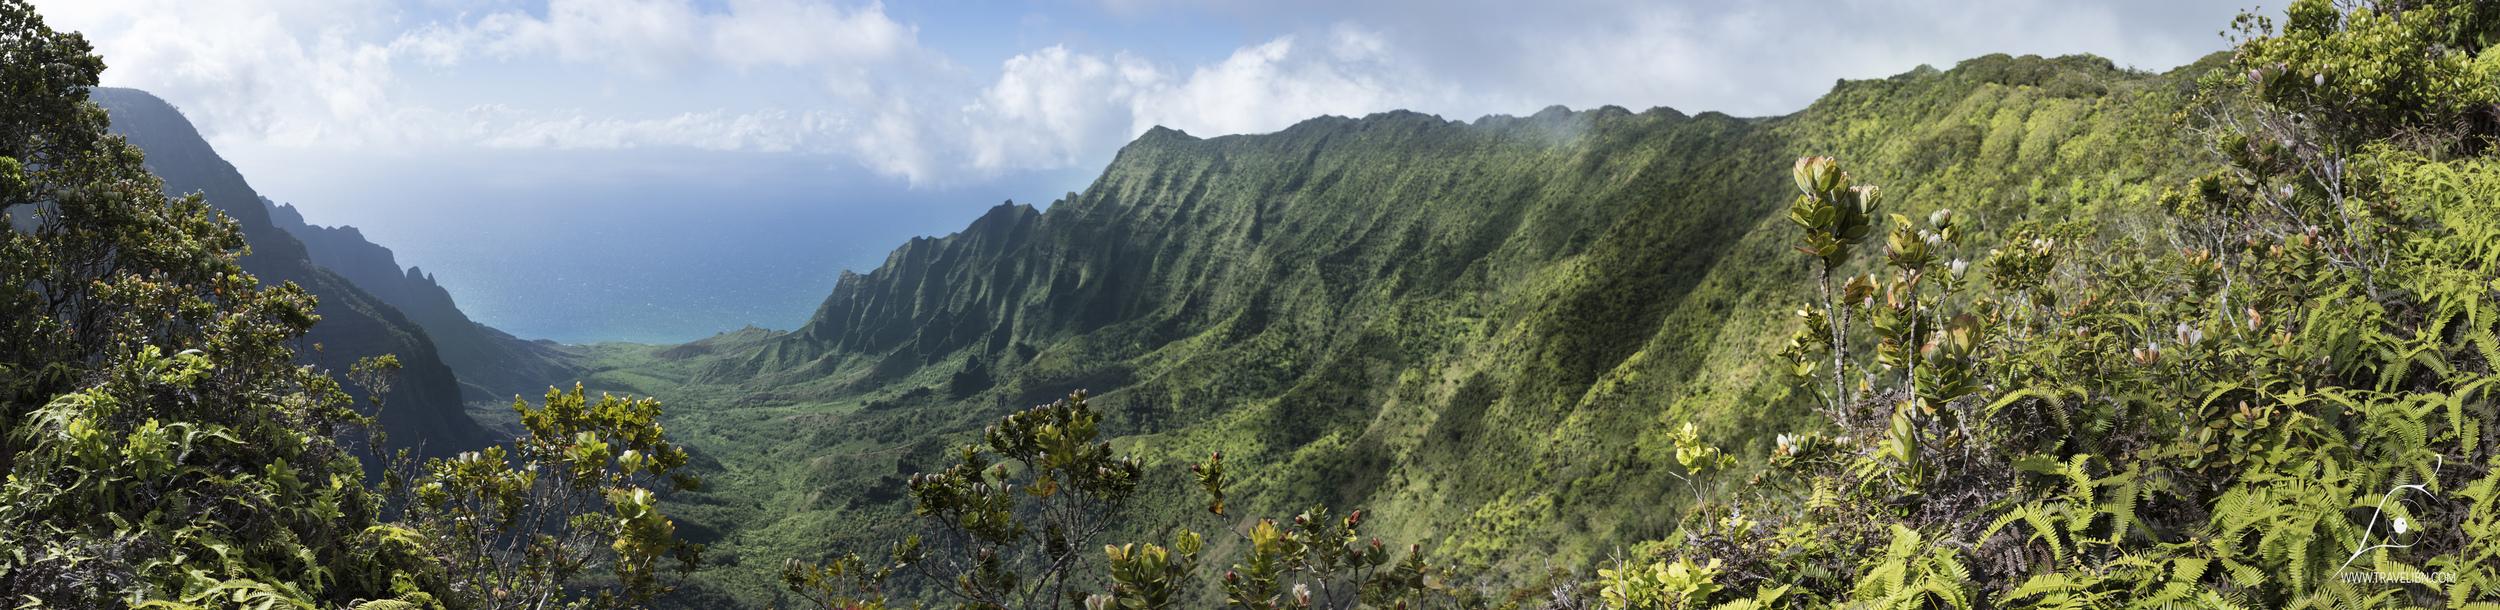 kalalau valley overlook.jpg